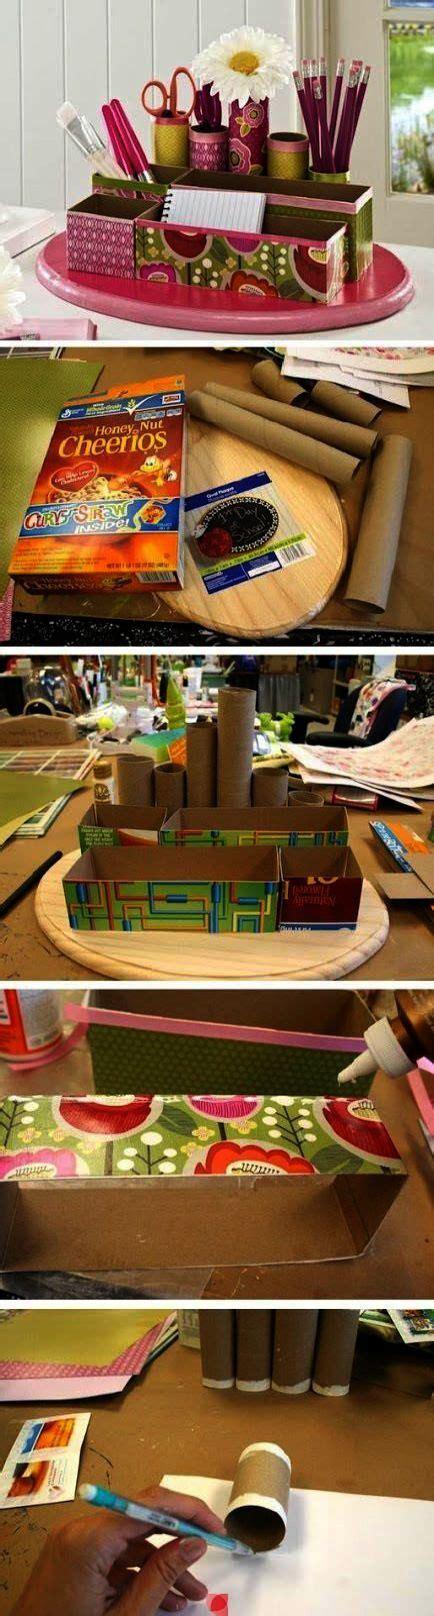 crafting table diy crafting table bed  crafting